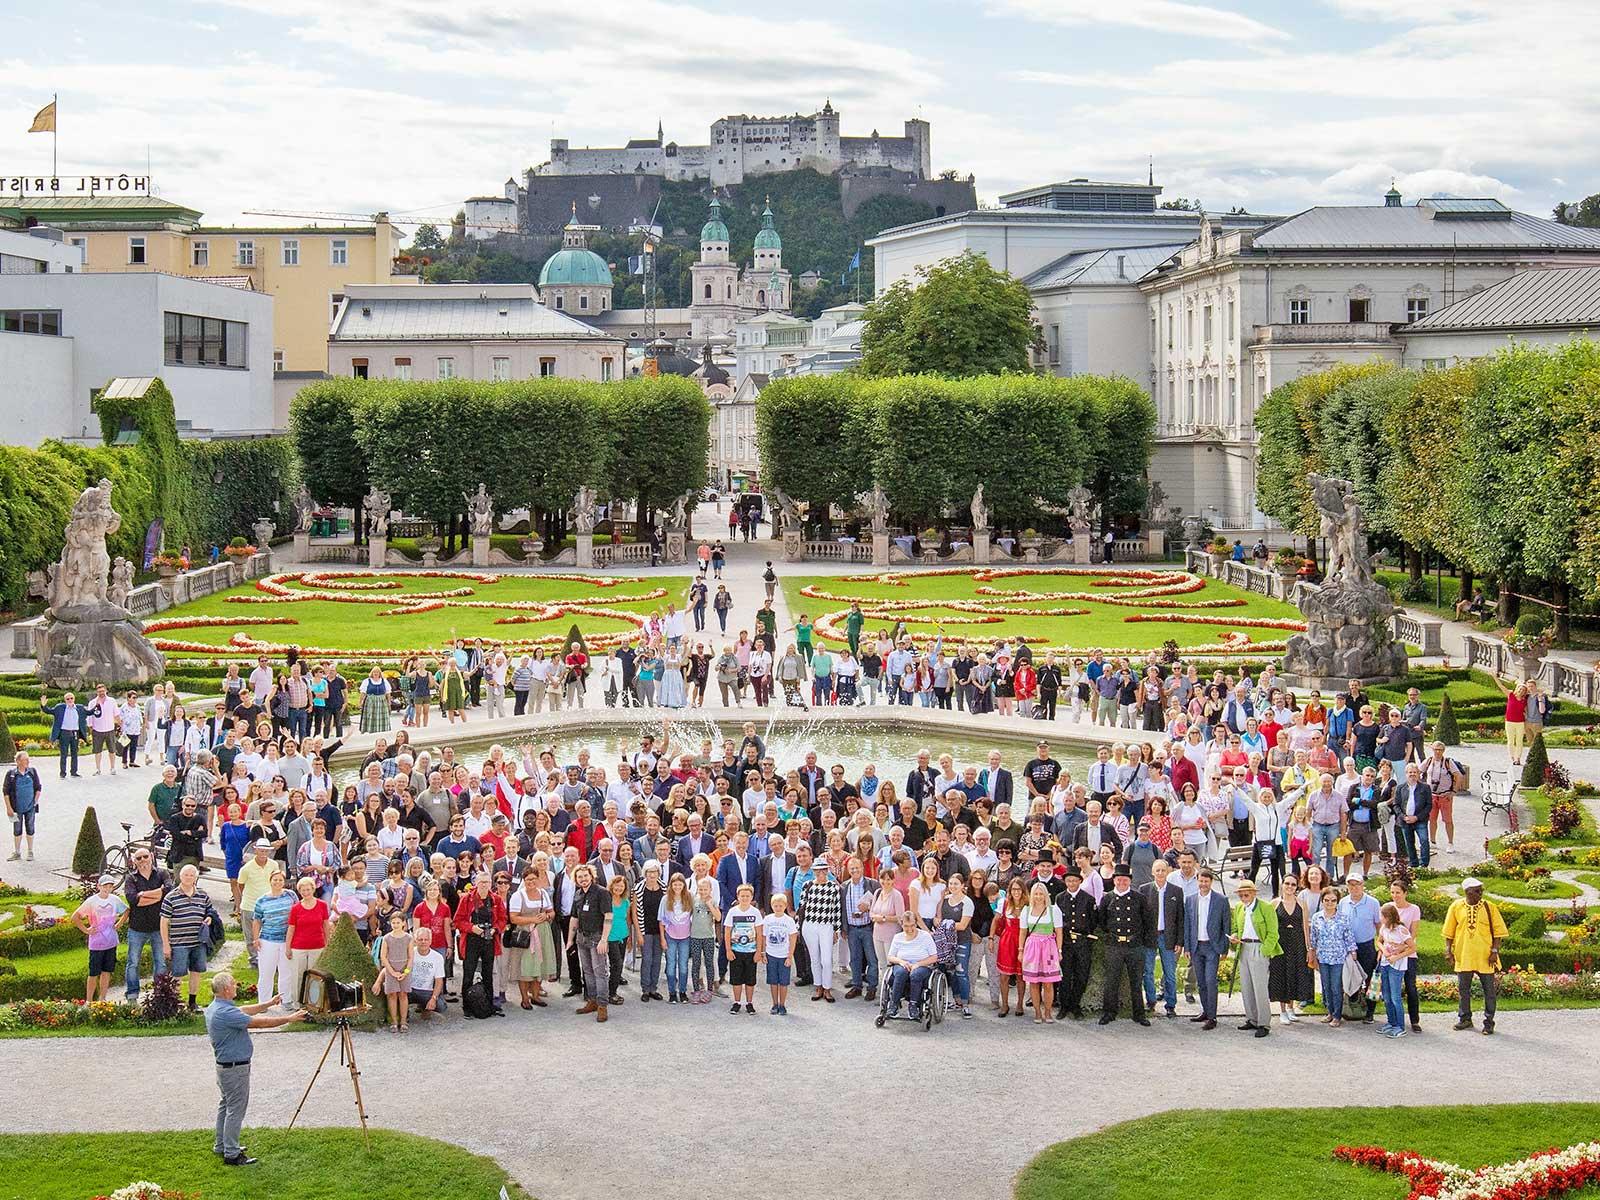 Salzburg-Cityguide - Foto - jubiaeum_fotografie20190819000.jpg